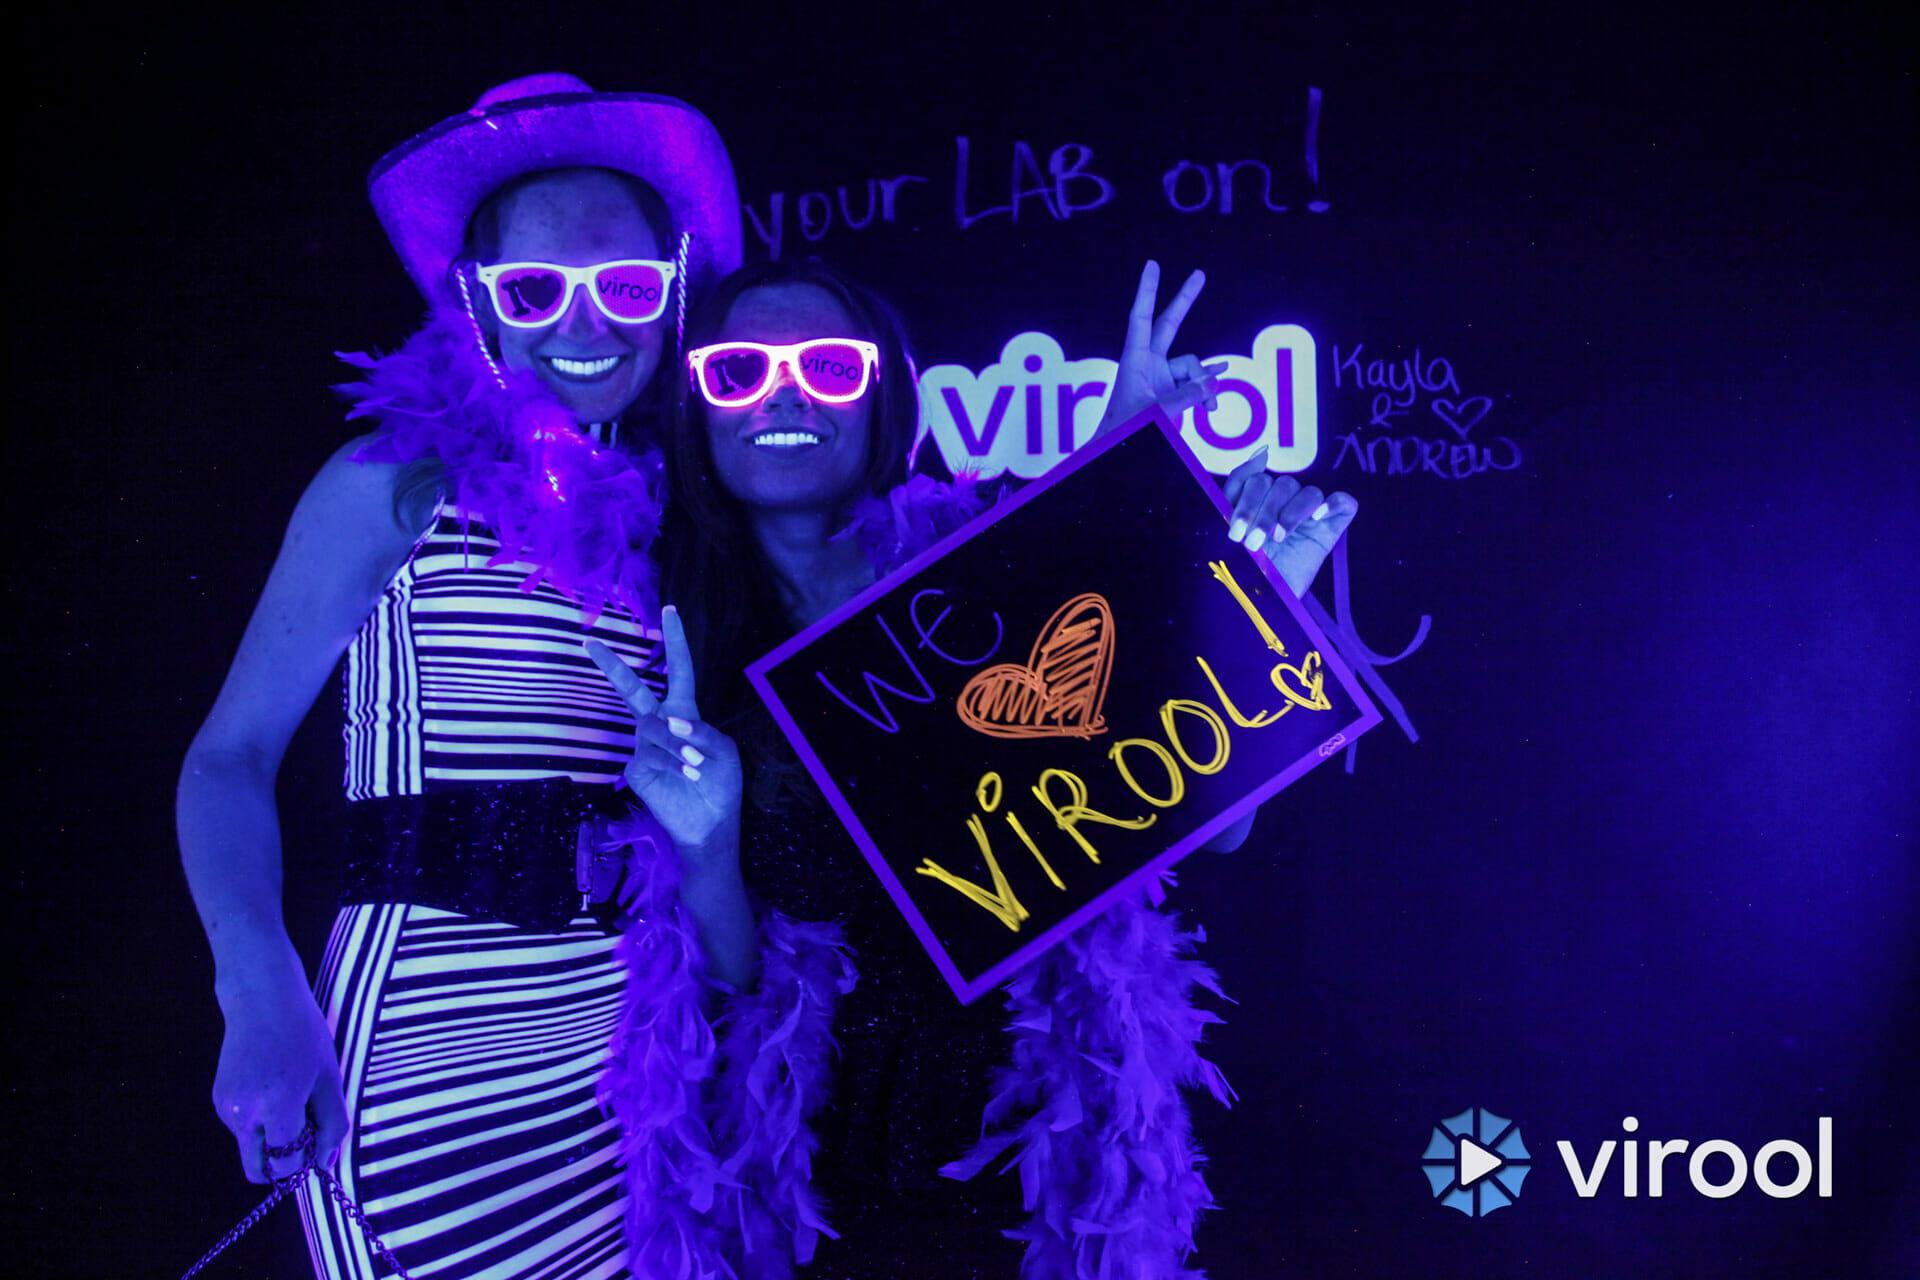 Virool Black Light Photo Booth